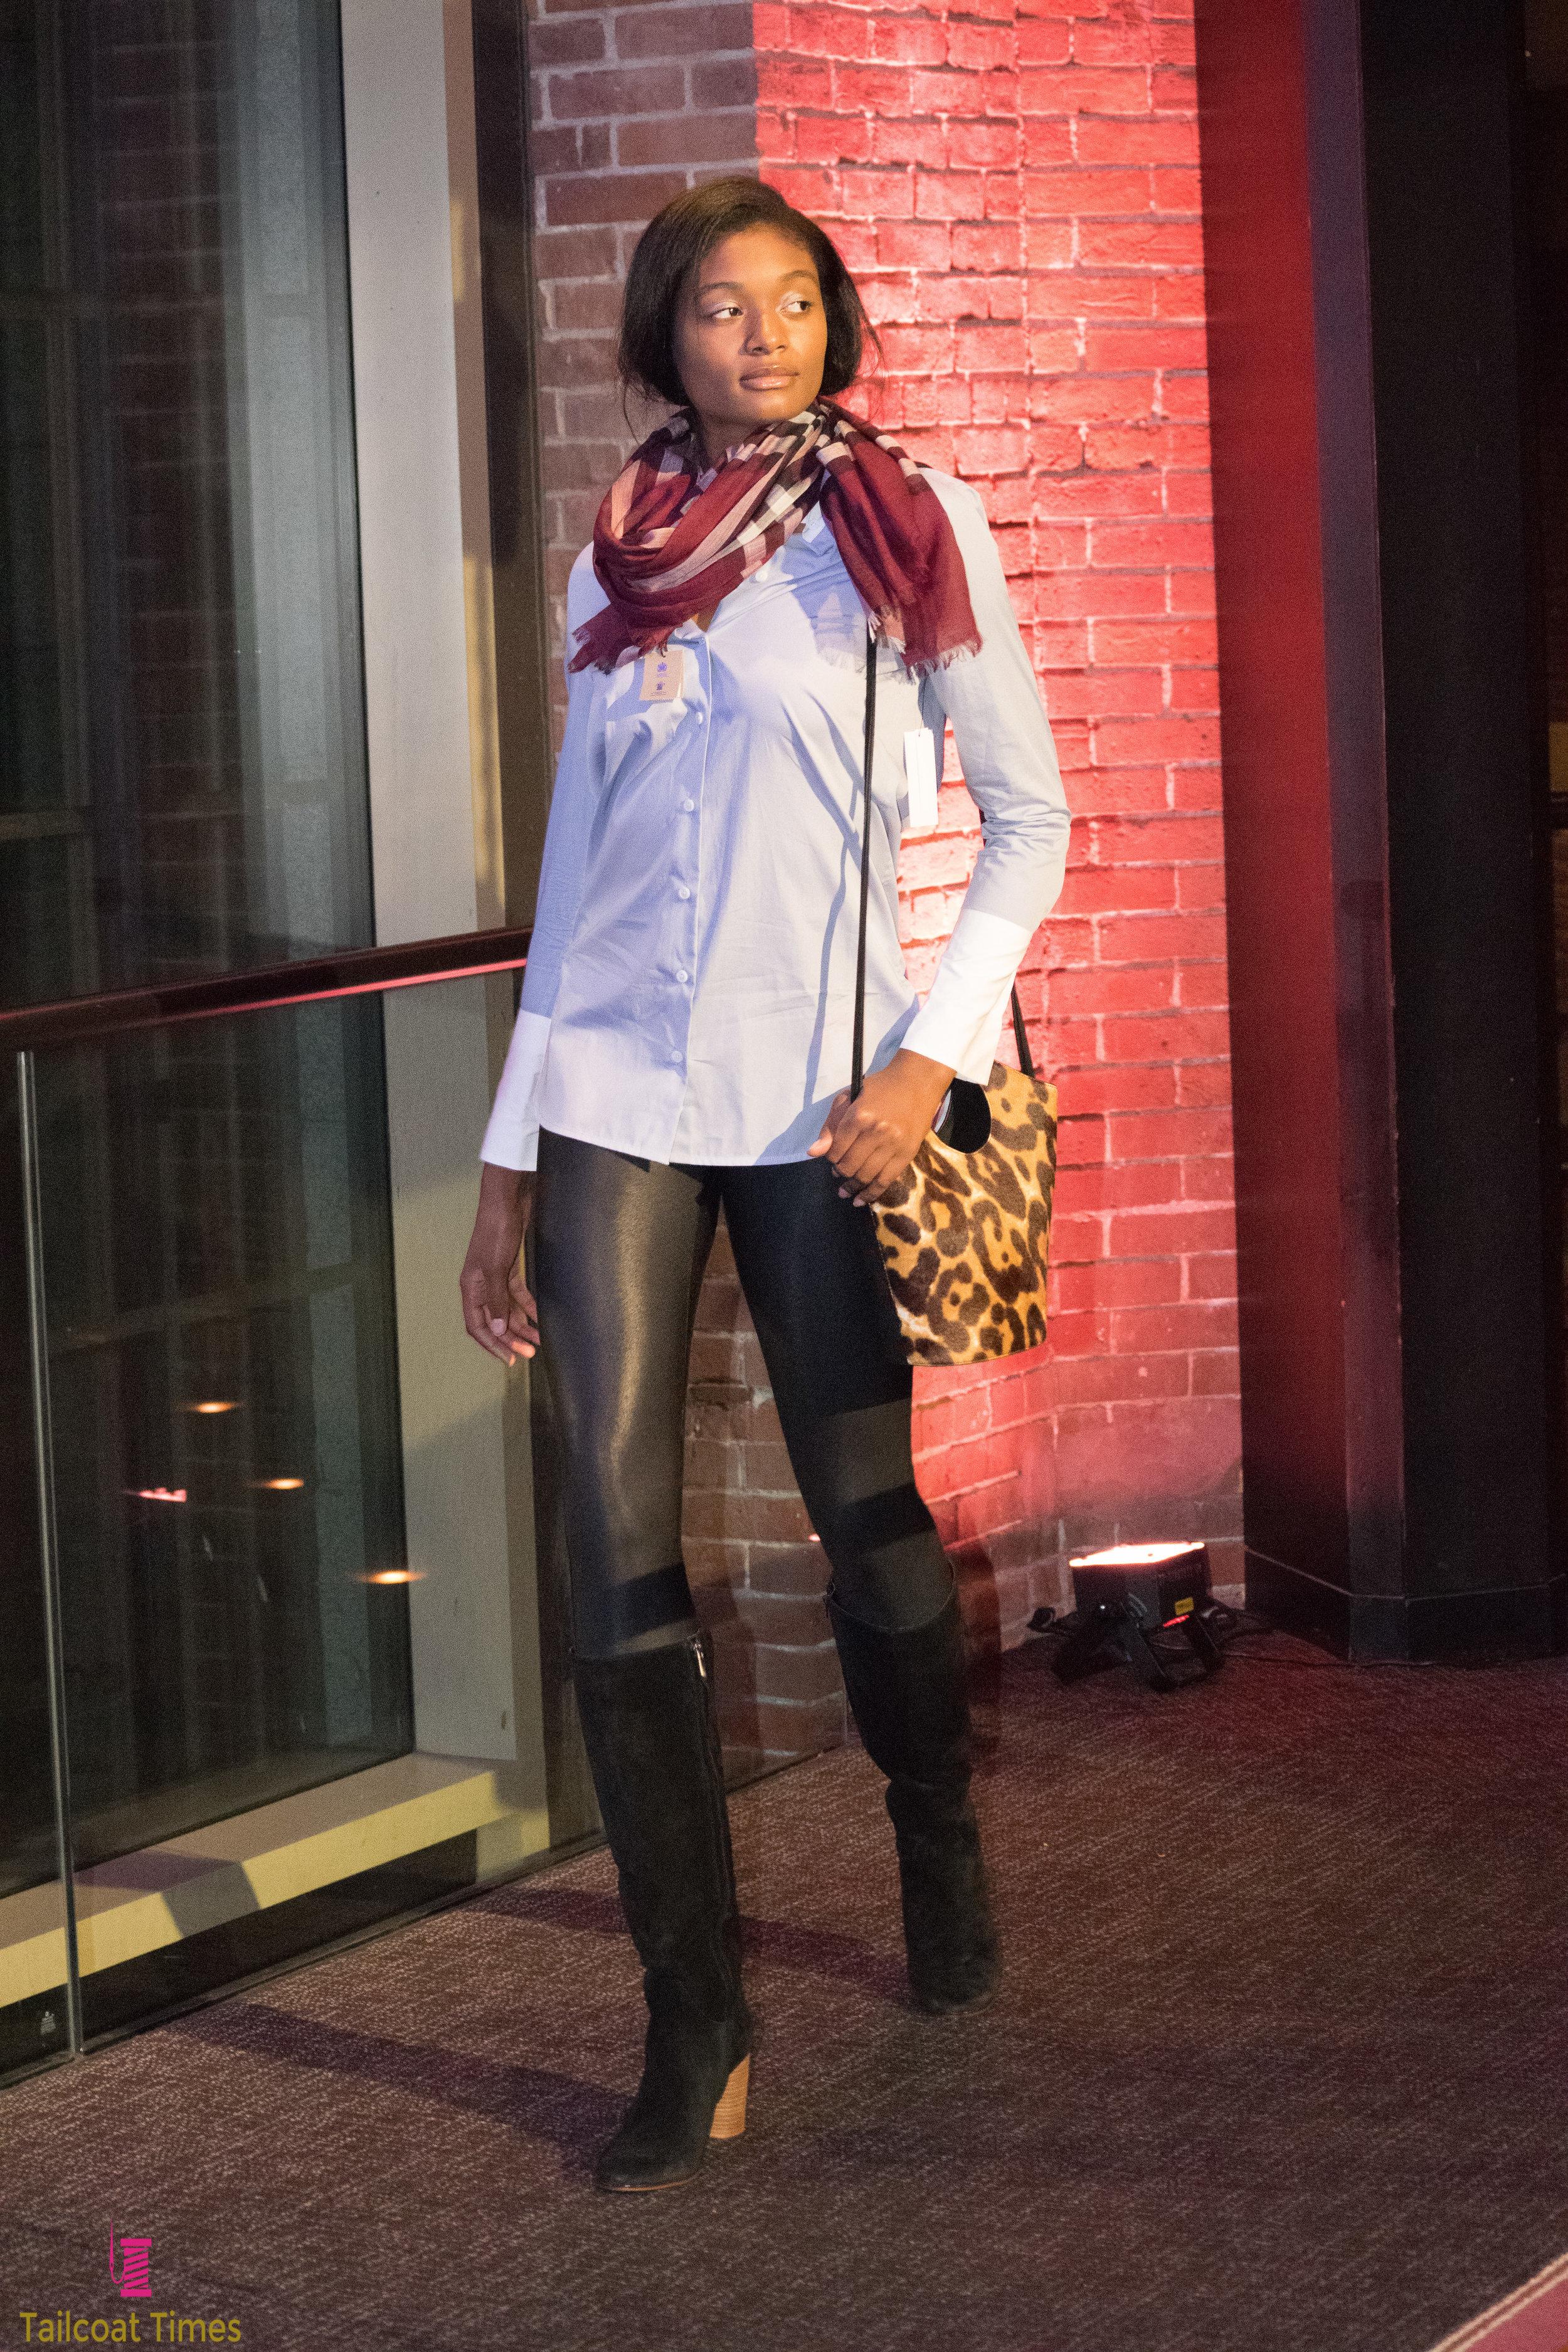 FashionablyLate_TrunkShow_Tailcoat Times (31 of 48).jpg